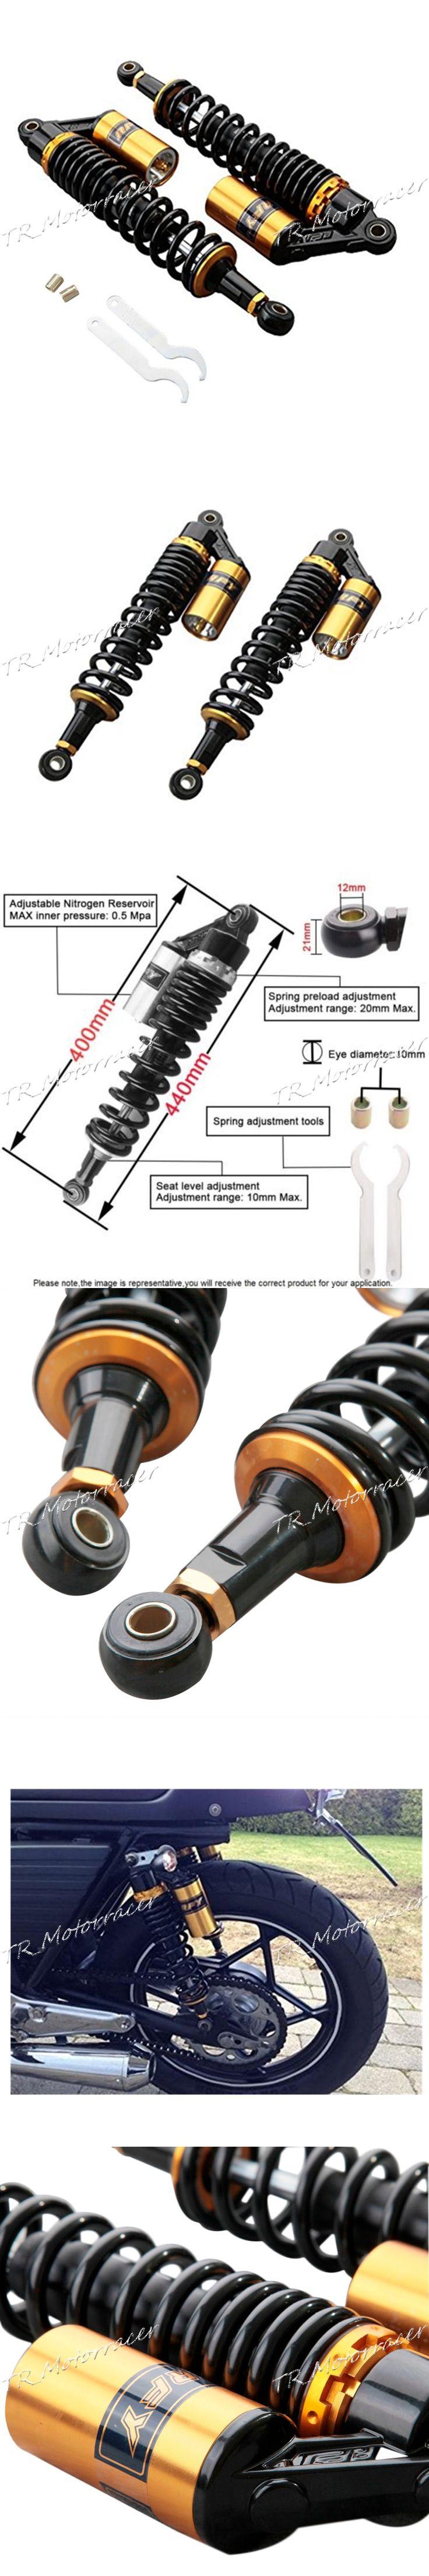 "15.75"" 400mm Air Shock Absorbers Universal For Honda Suzuki Yamaha Kawasaki ATV Go Kart Quad Dirt Sport Bikes Black and Gold"